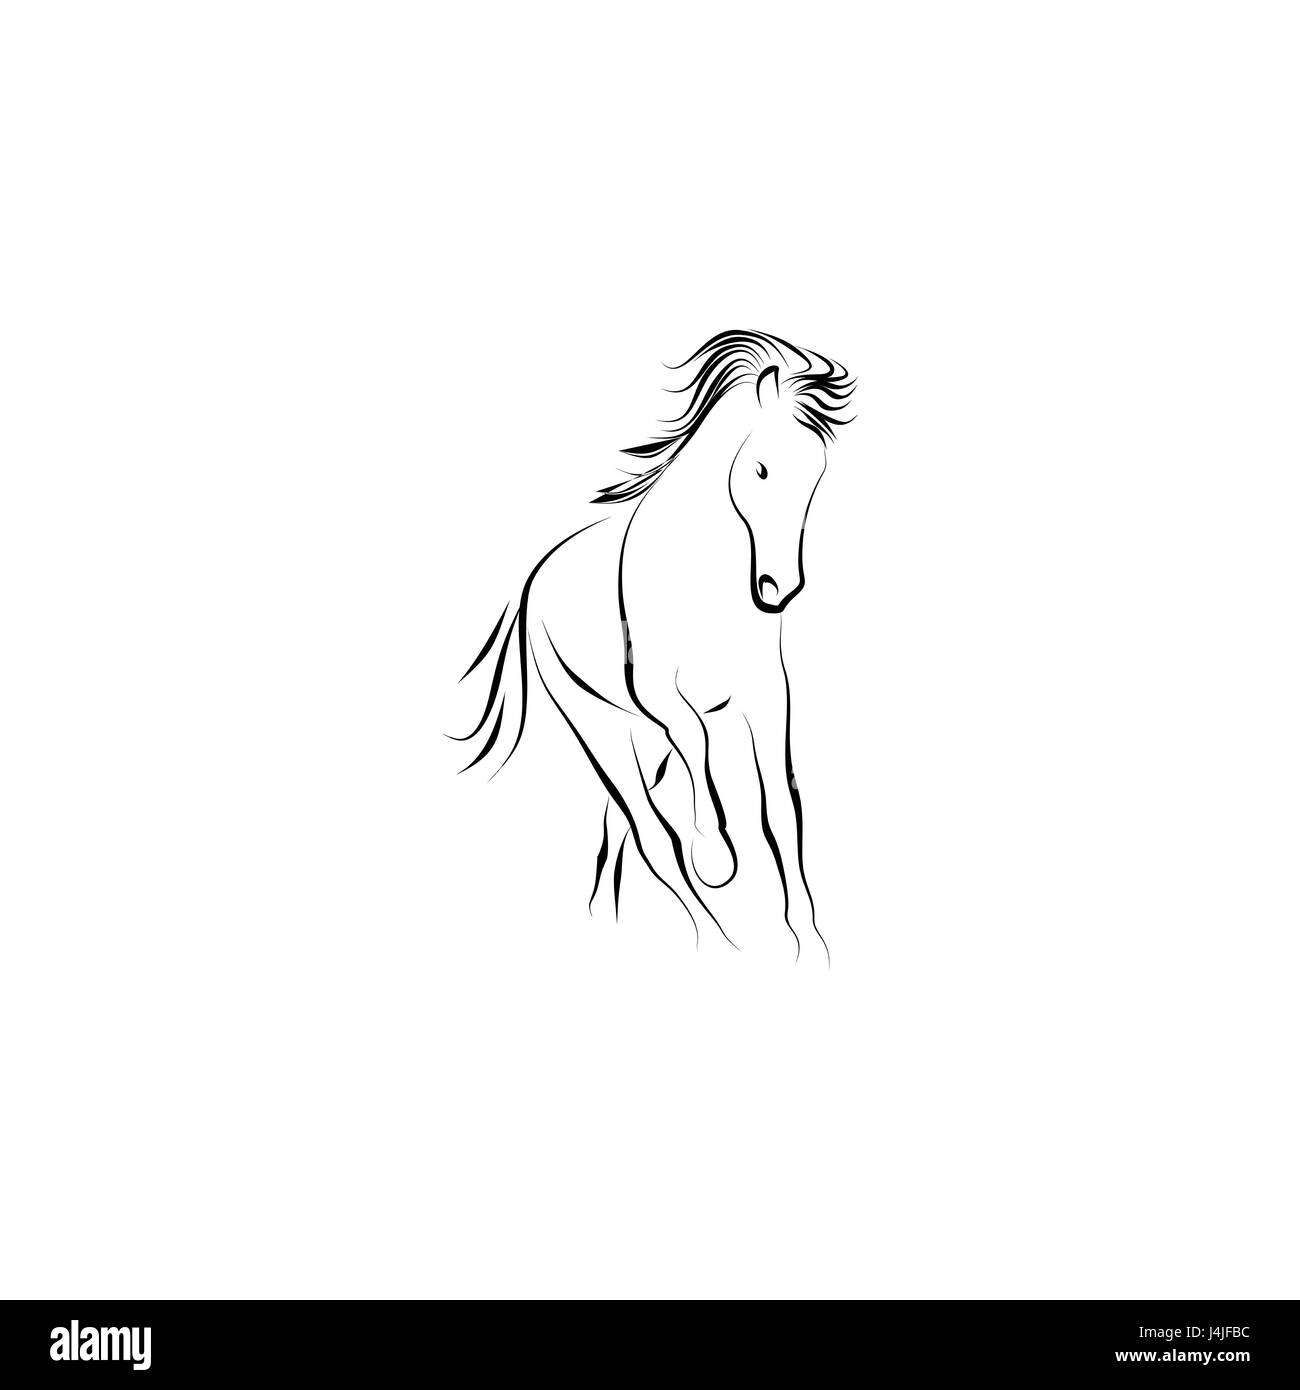 Running horse - Stock Image